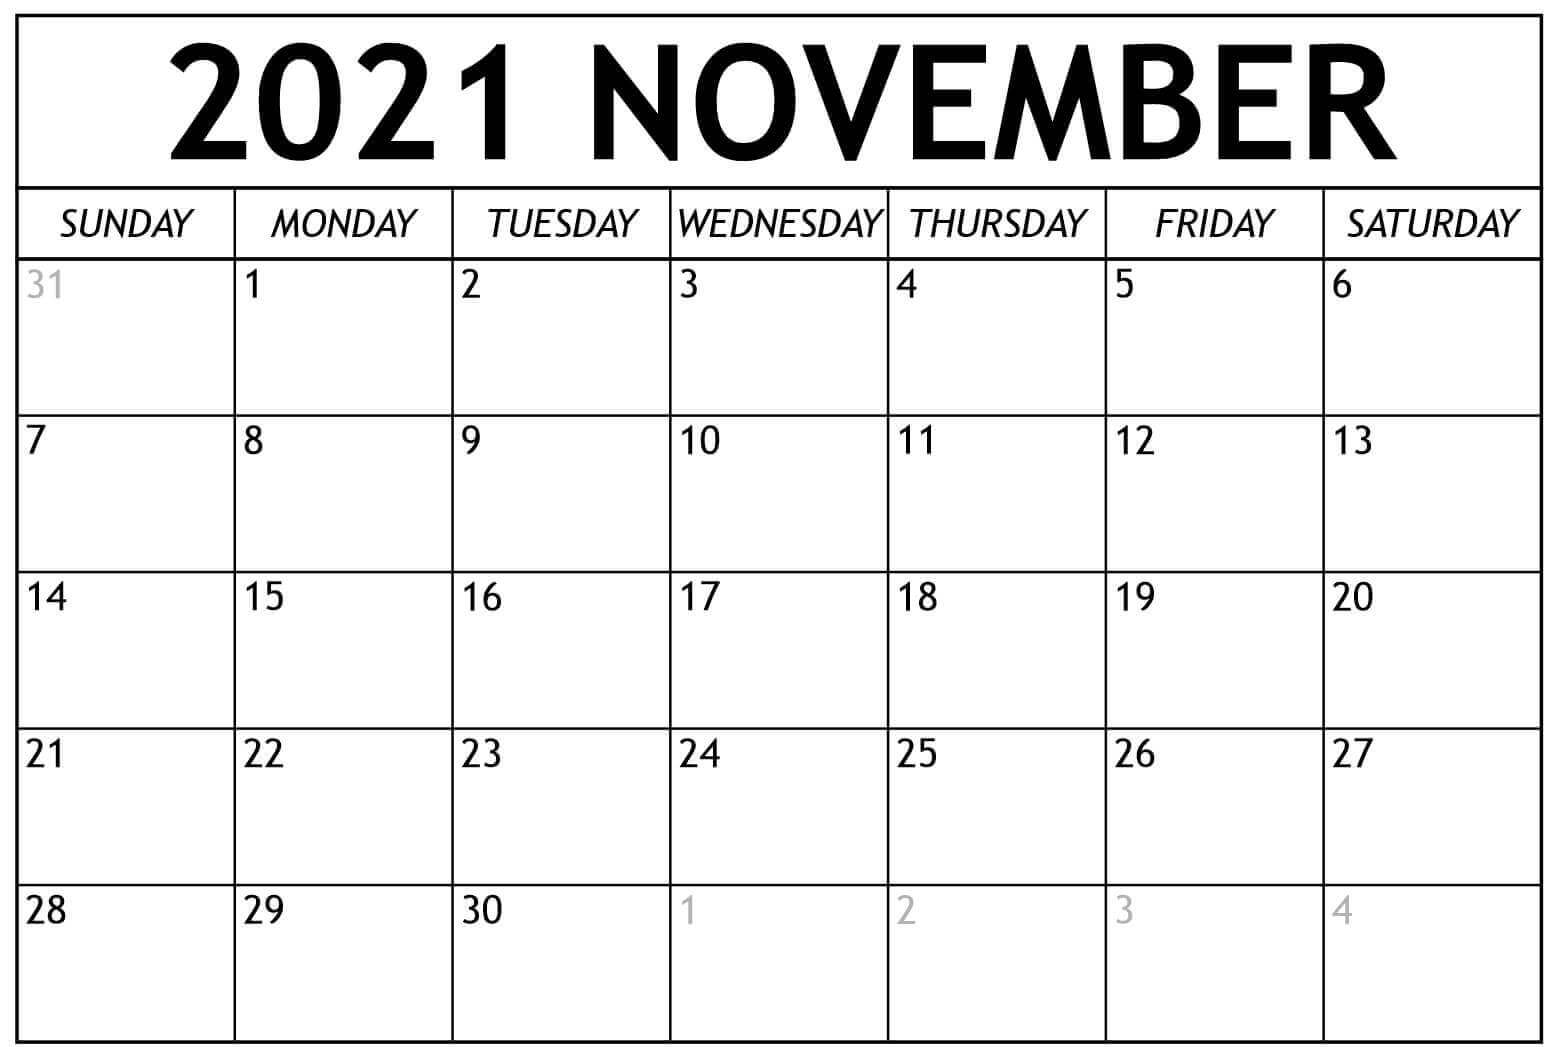 2021 November Calendar PDF